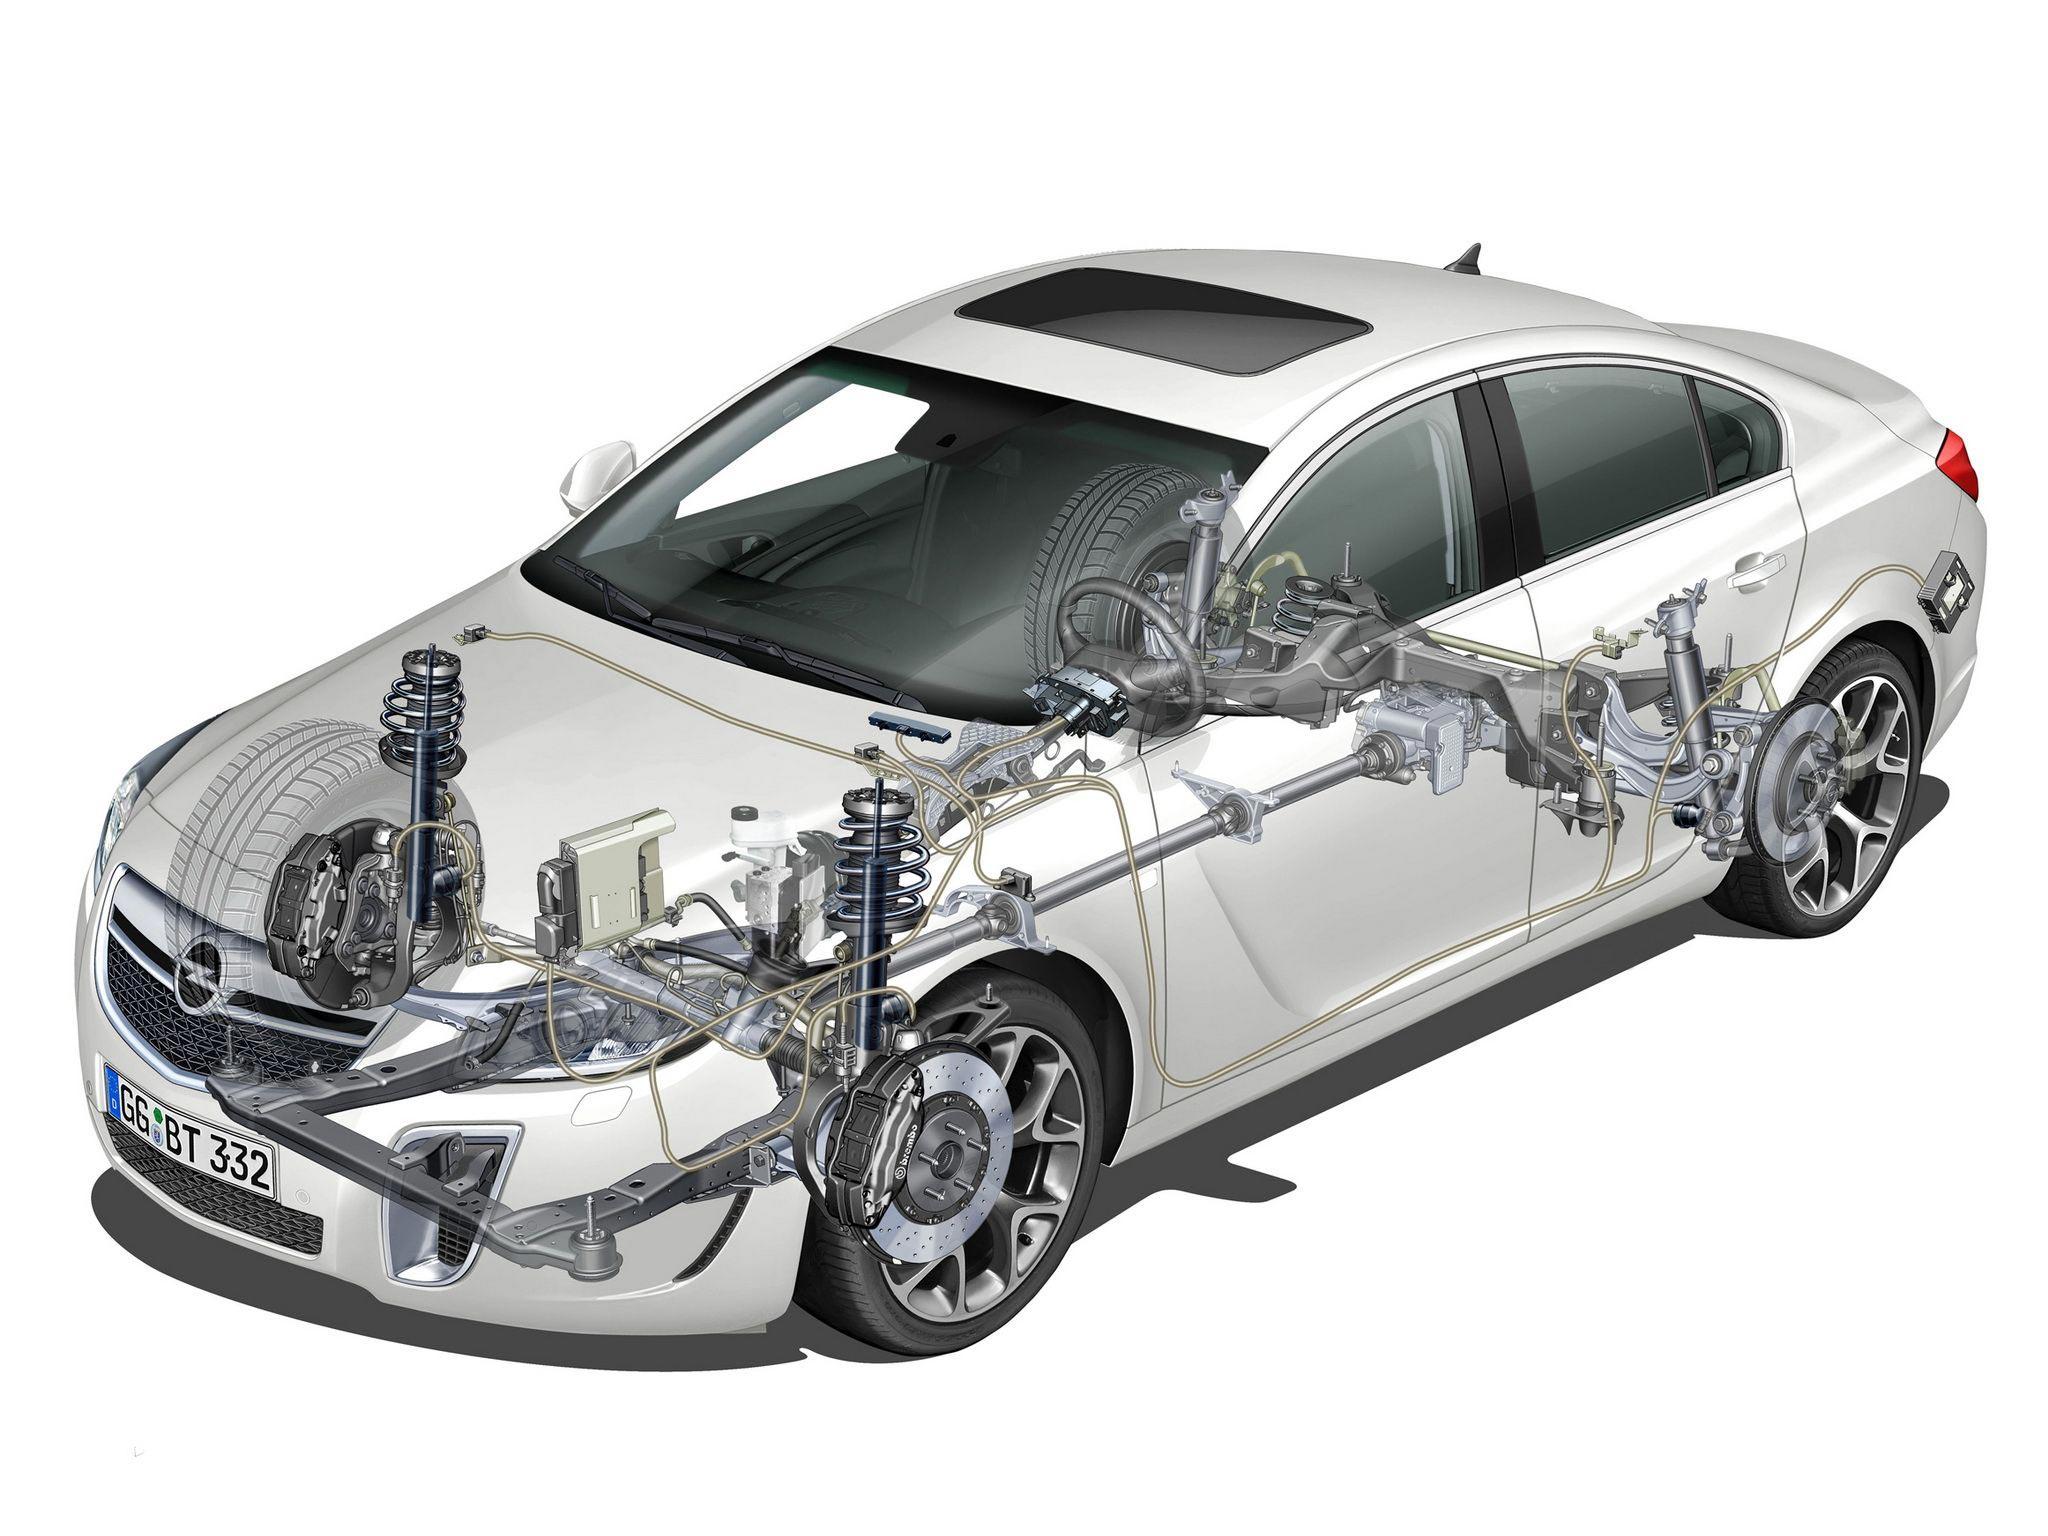 Opel Insignia cutaway drawing